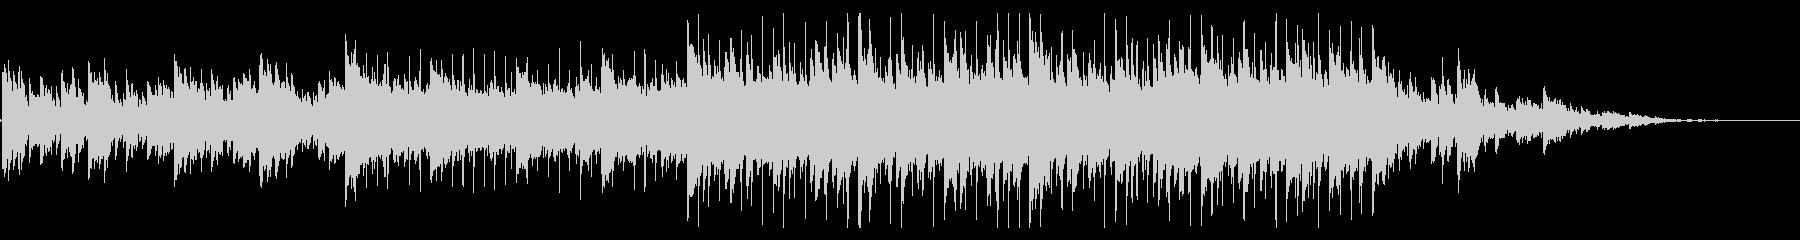 bgm40の未再生の波形